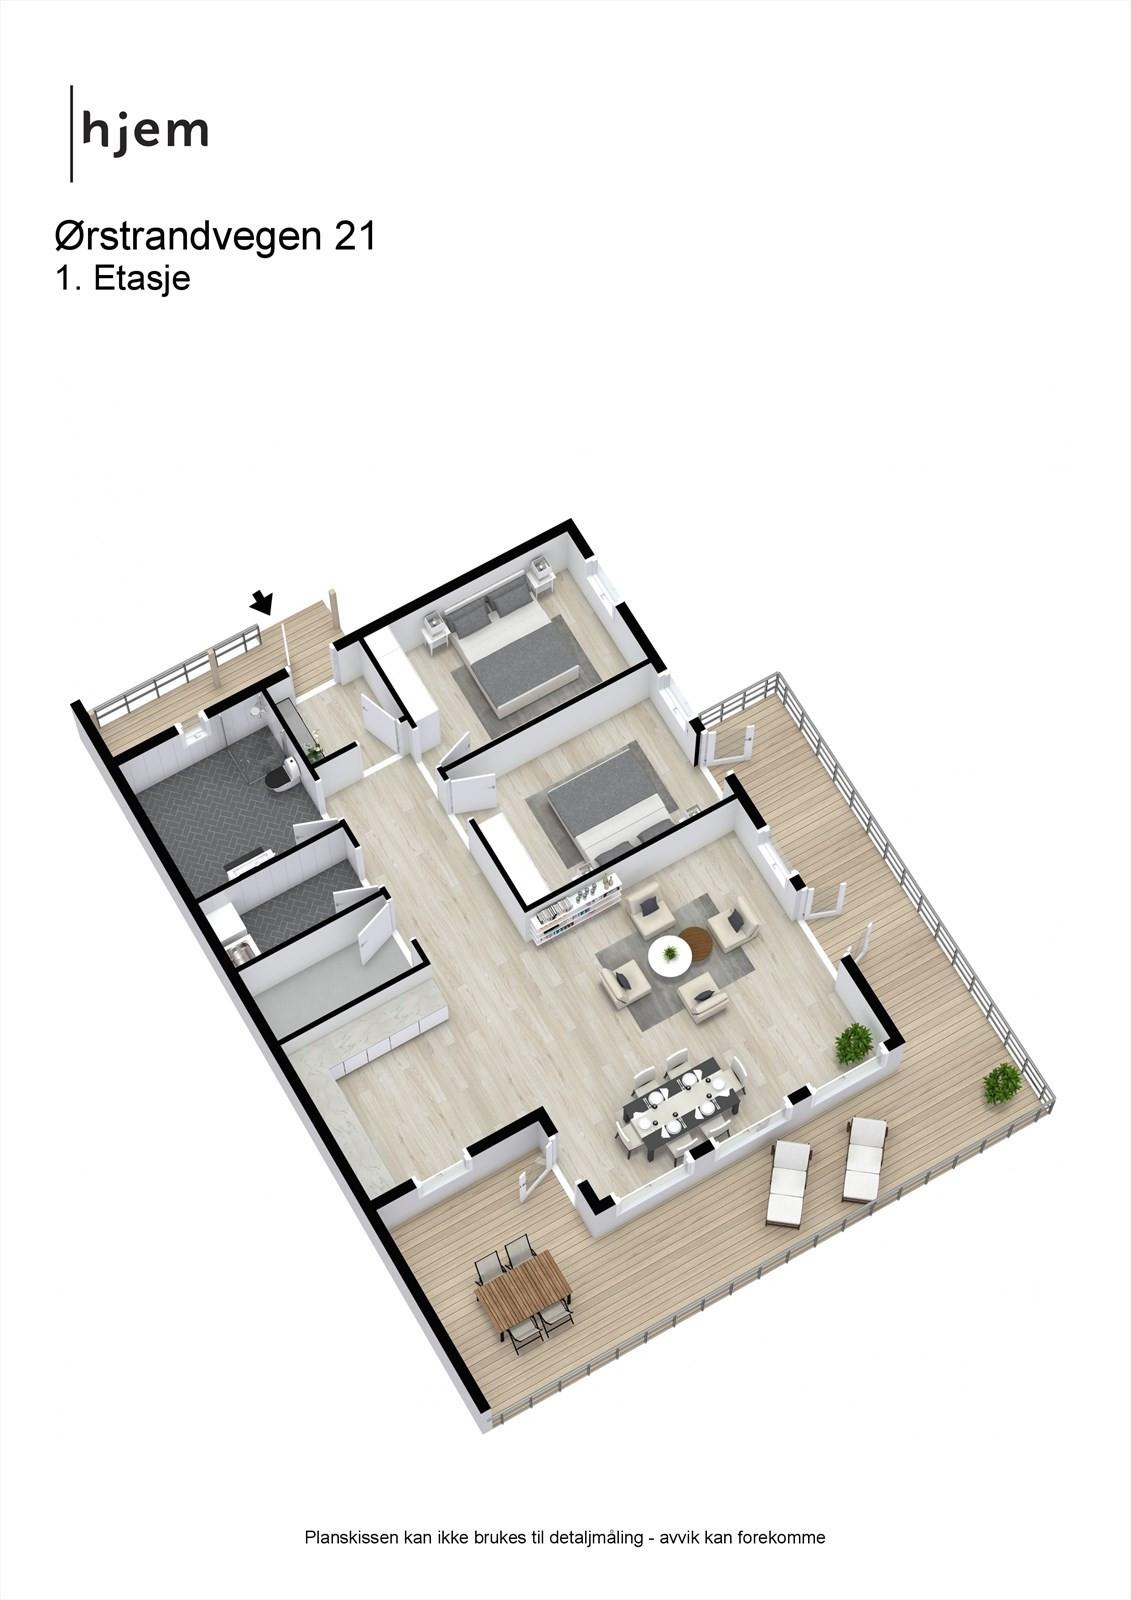 Ørstrandvegen 21 - 3D - 1. Etasje